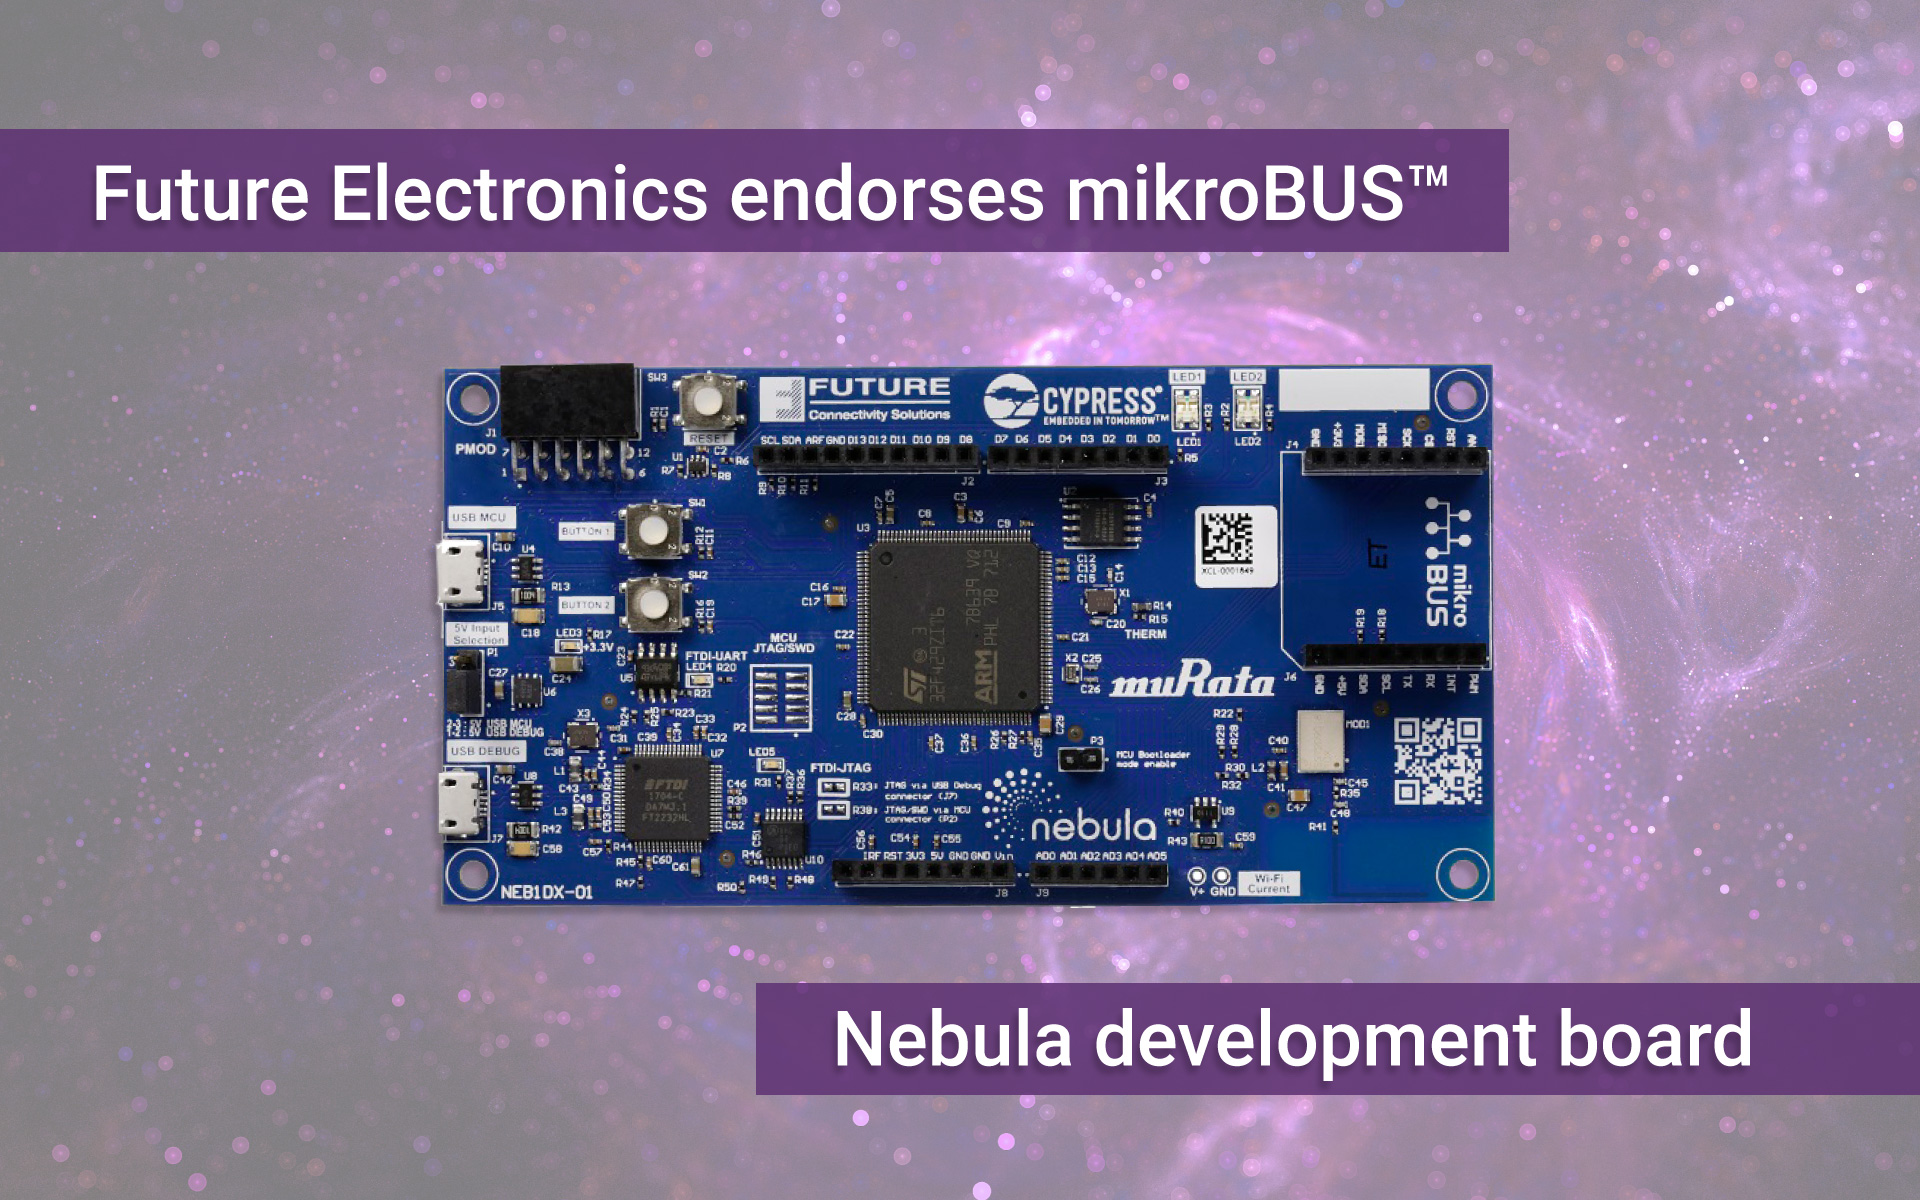 Future Electronic endorses the mikroBUS™ - Nebula development board